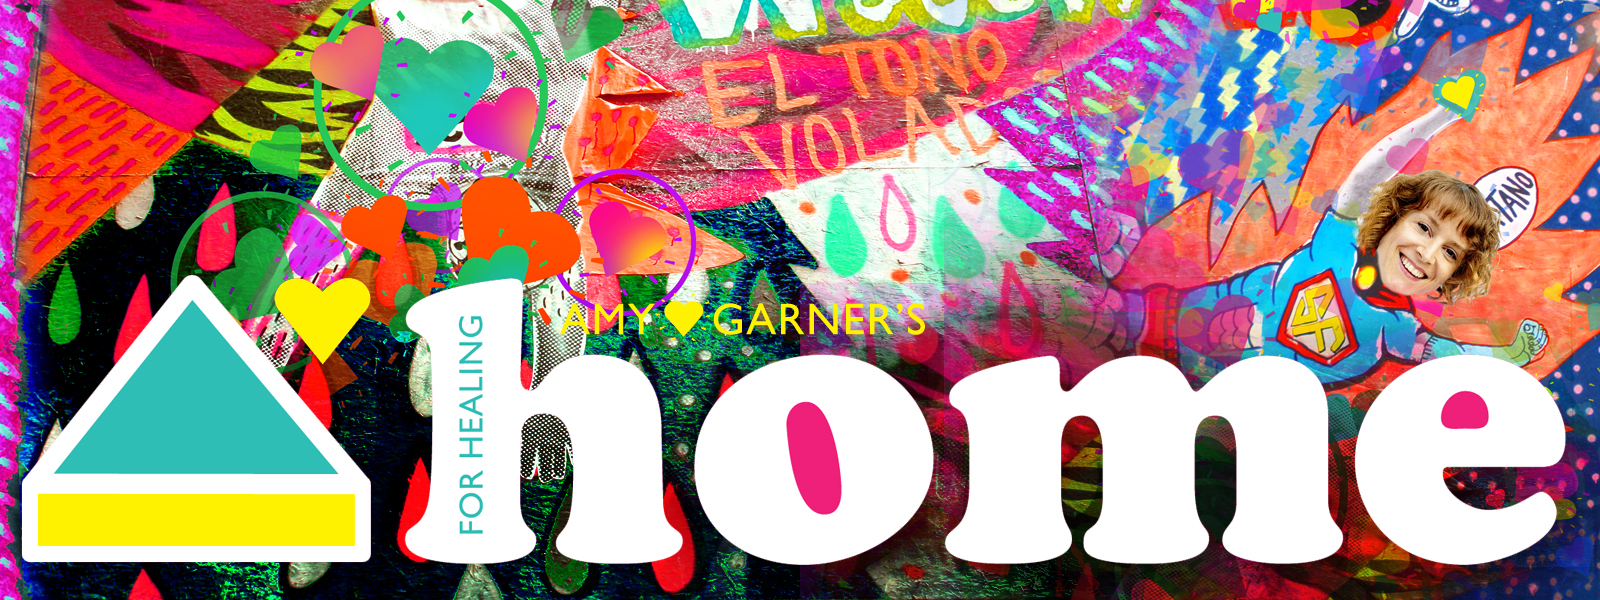 helloamygarner-become-a-member-image-1600